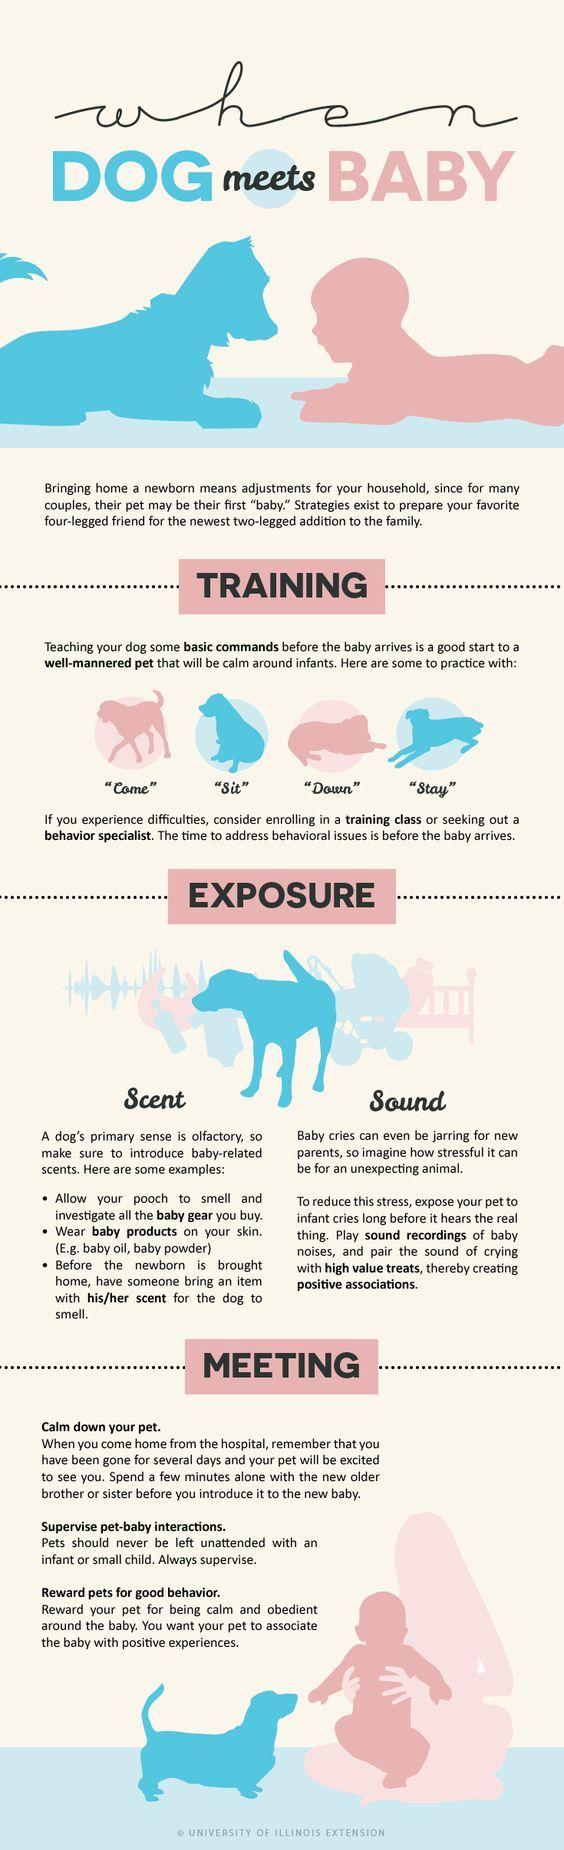 """When Dog Meets Baby"" infographic - tips and tricks for new parents! - Babies und Hunde an einander gewöhnen"